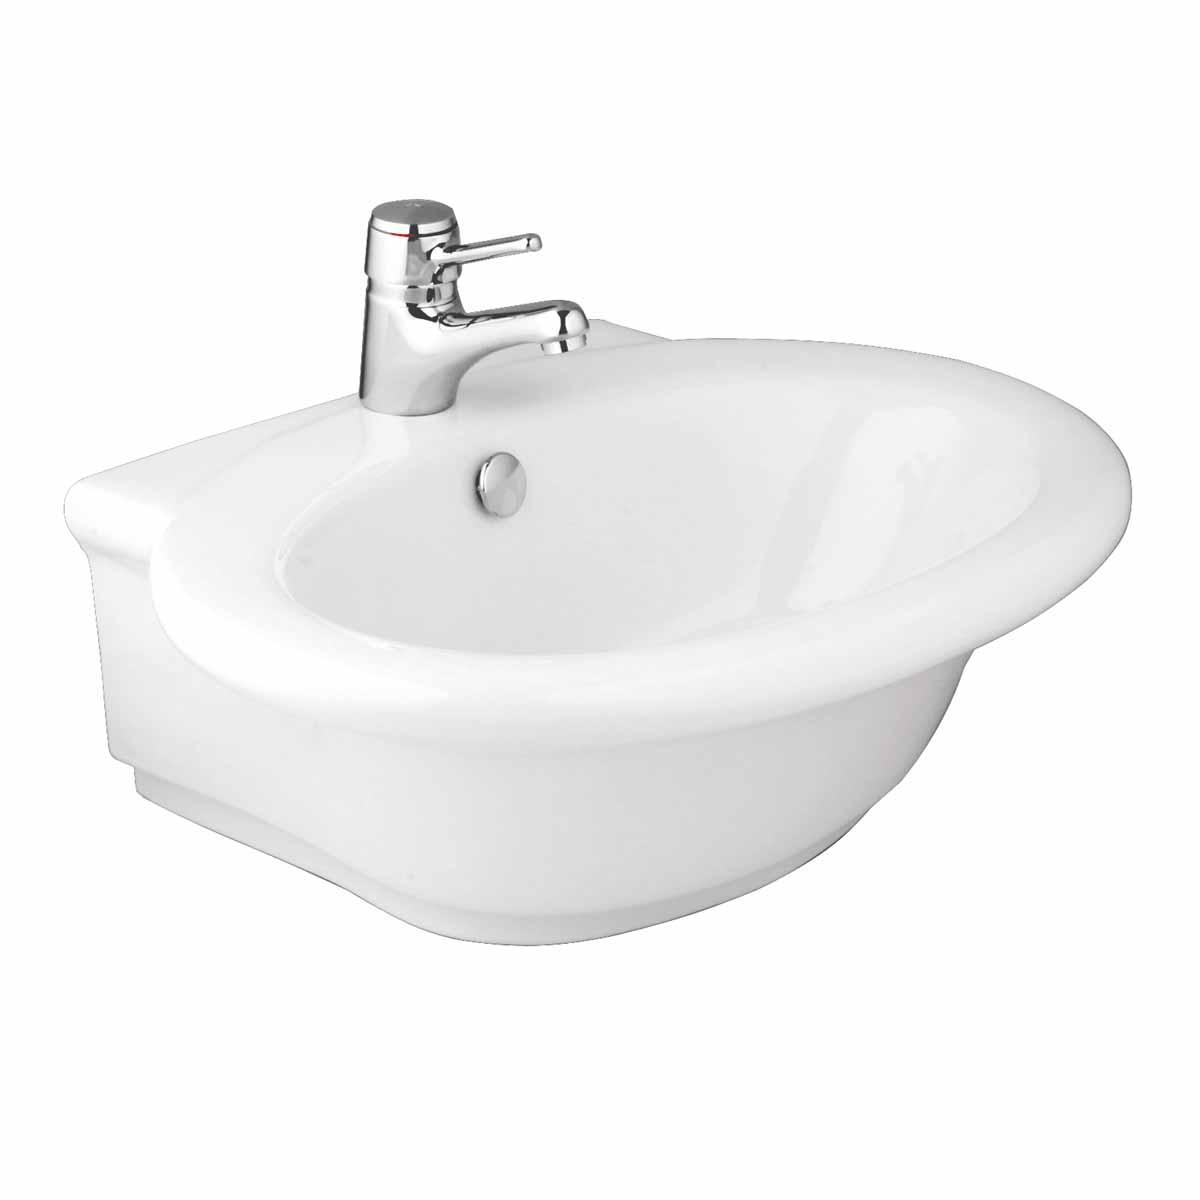 White Bathroom Vessel Sink Vitreous China Single Hole Faucet Gloss ...